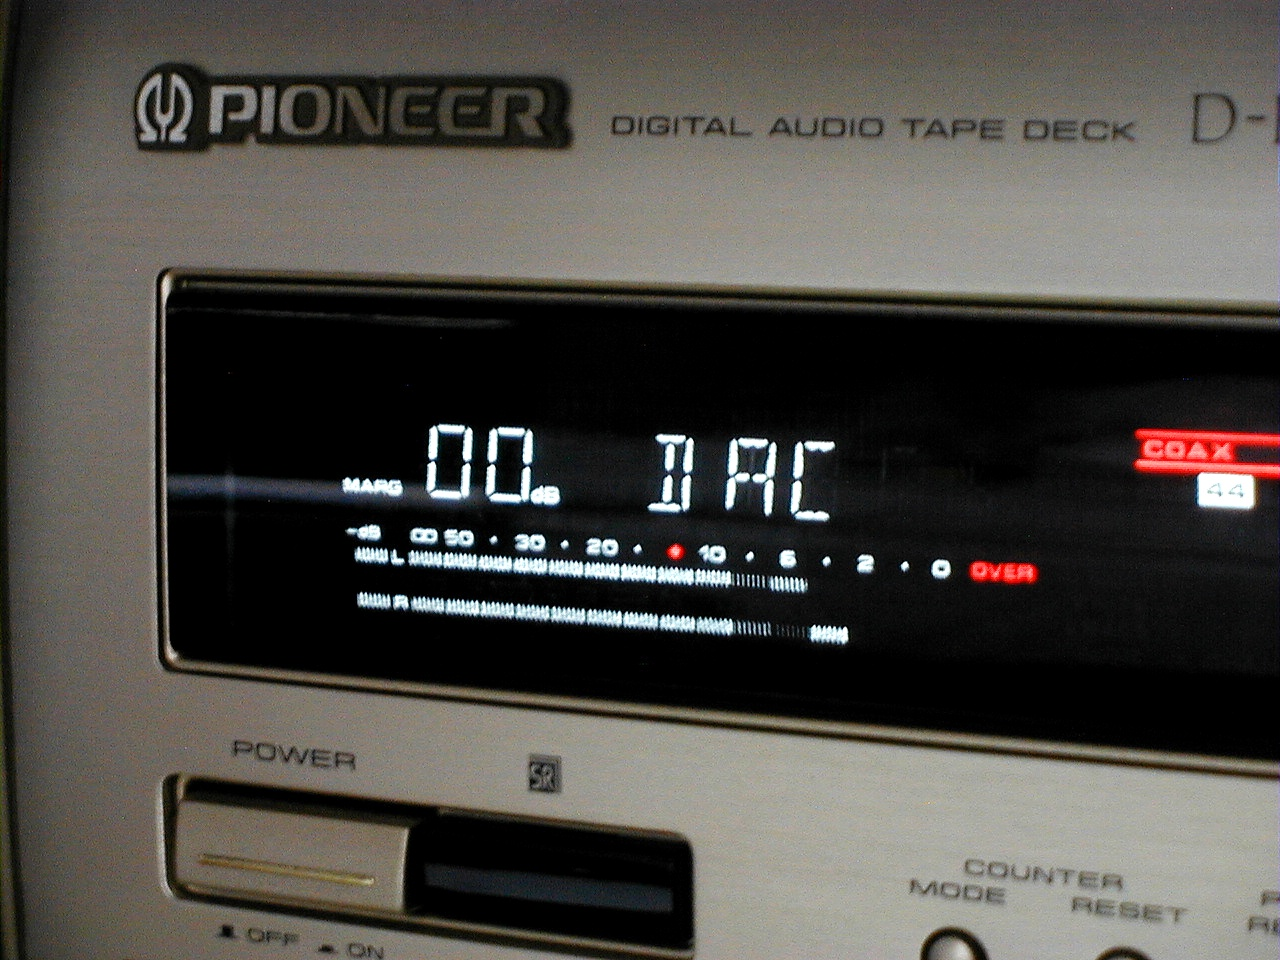 recording_010.jpg/